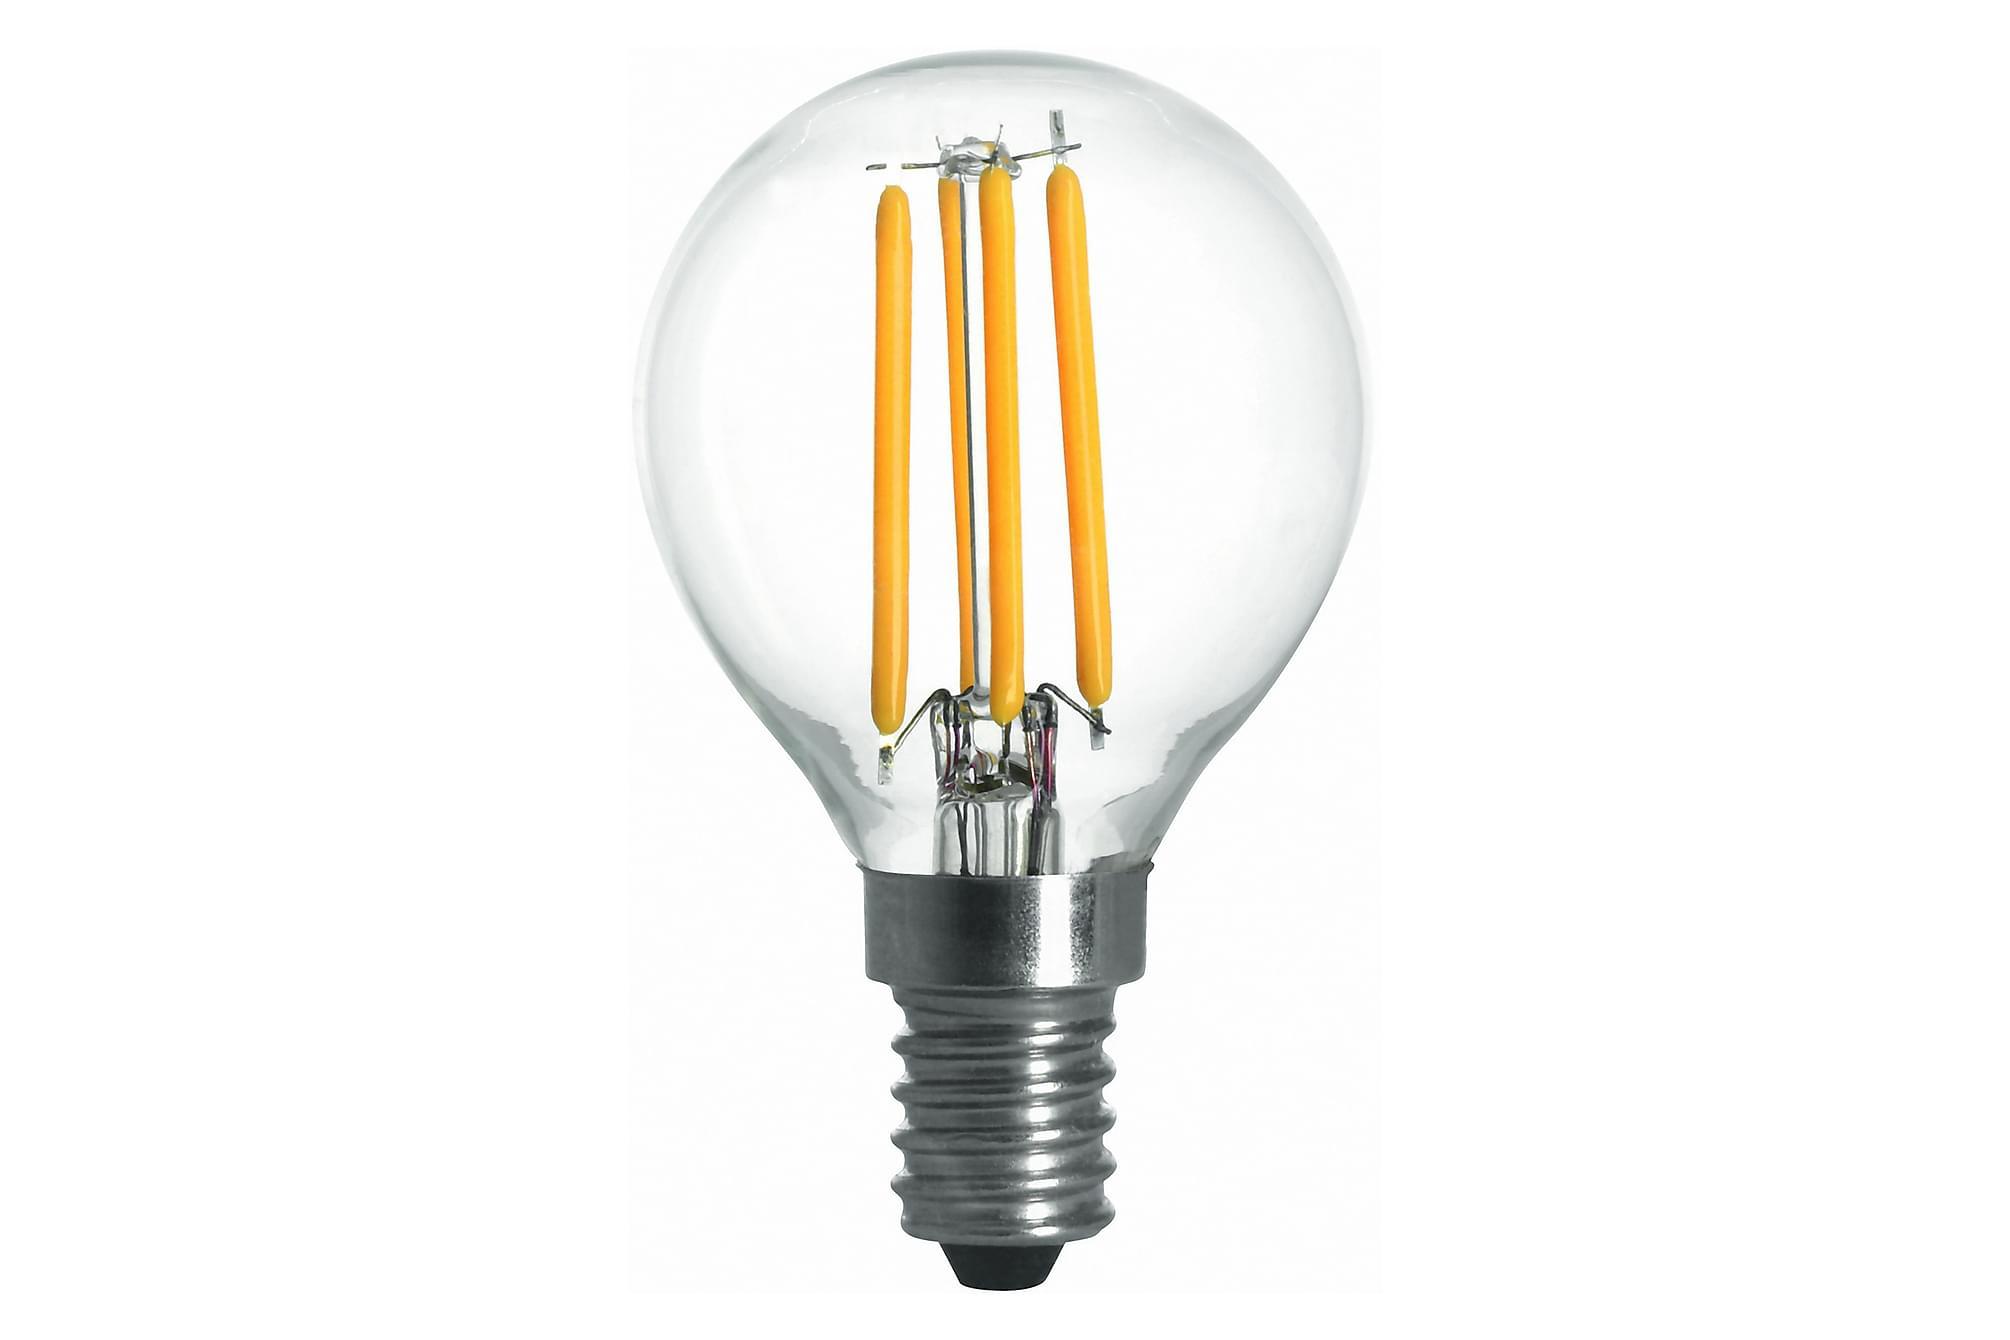 KIBBLE LED-lampa 1,8W E14 Filament Klar, Glödlampor & ljuskällor